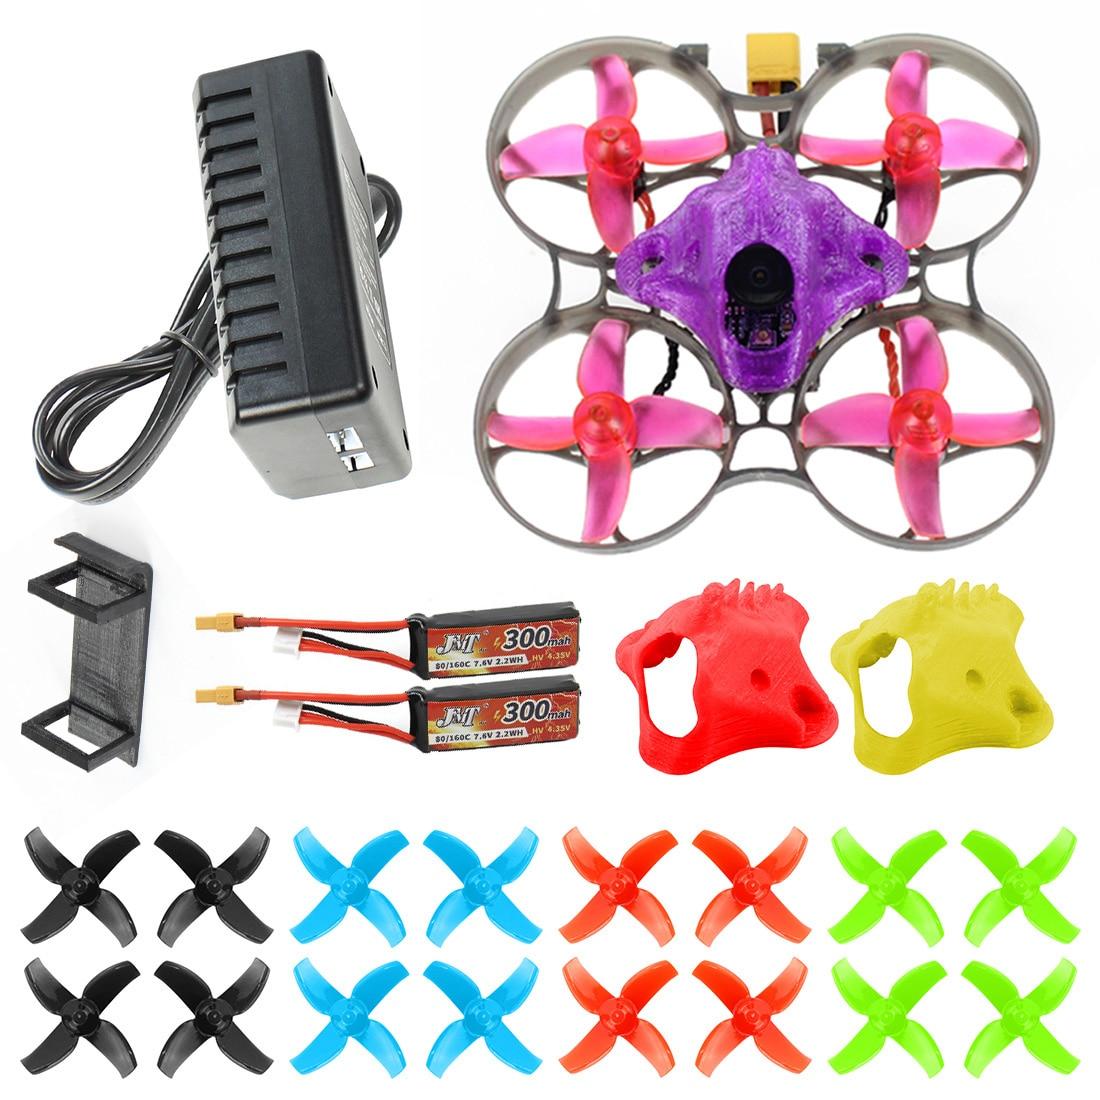 DIY FPV Racing Drone RC Quadcopter BNF with Mobula7 V3 75MM Frame Crazybee F4 Pro V2.1 2-3S Flight Controller SE0802 Motors Part